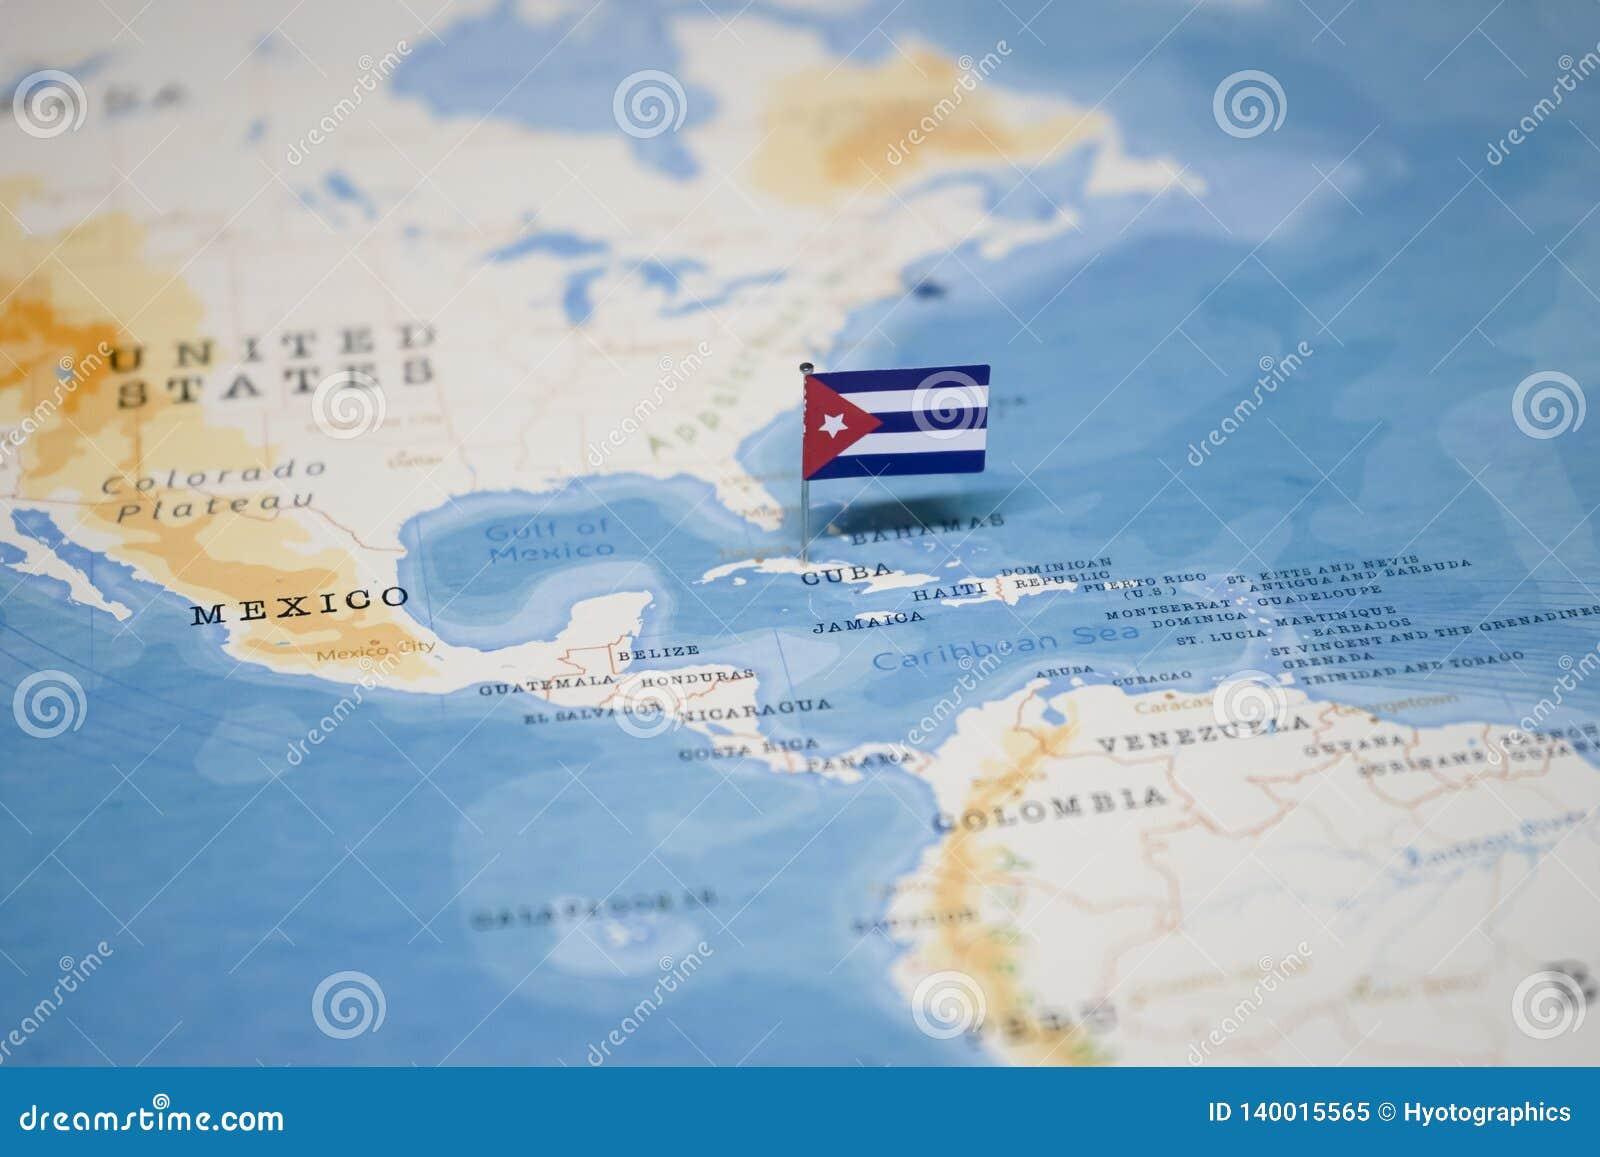 Cuba Mapa Del Mundo.La Bandera De Cuba En El Mapa Del Mundo Imagen De Archivo Imagen De Bandera Mapa 140015565